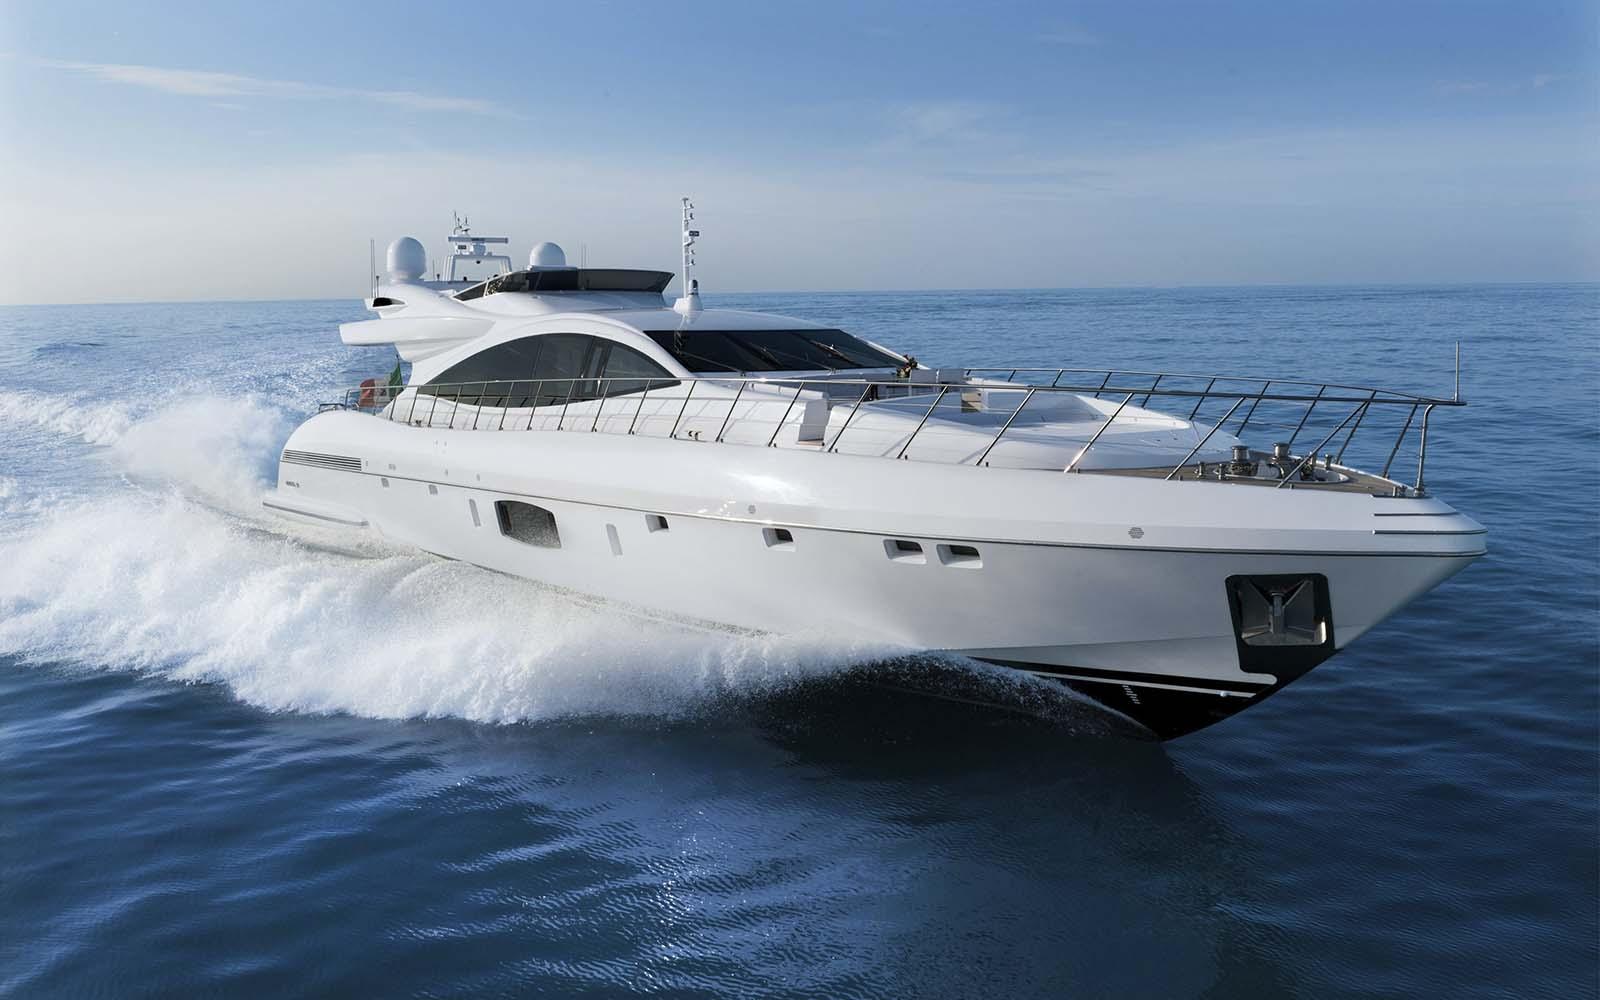 Mangusta 110 - boat shopping